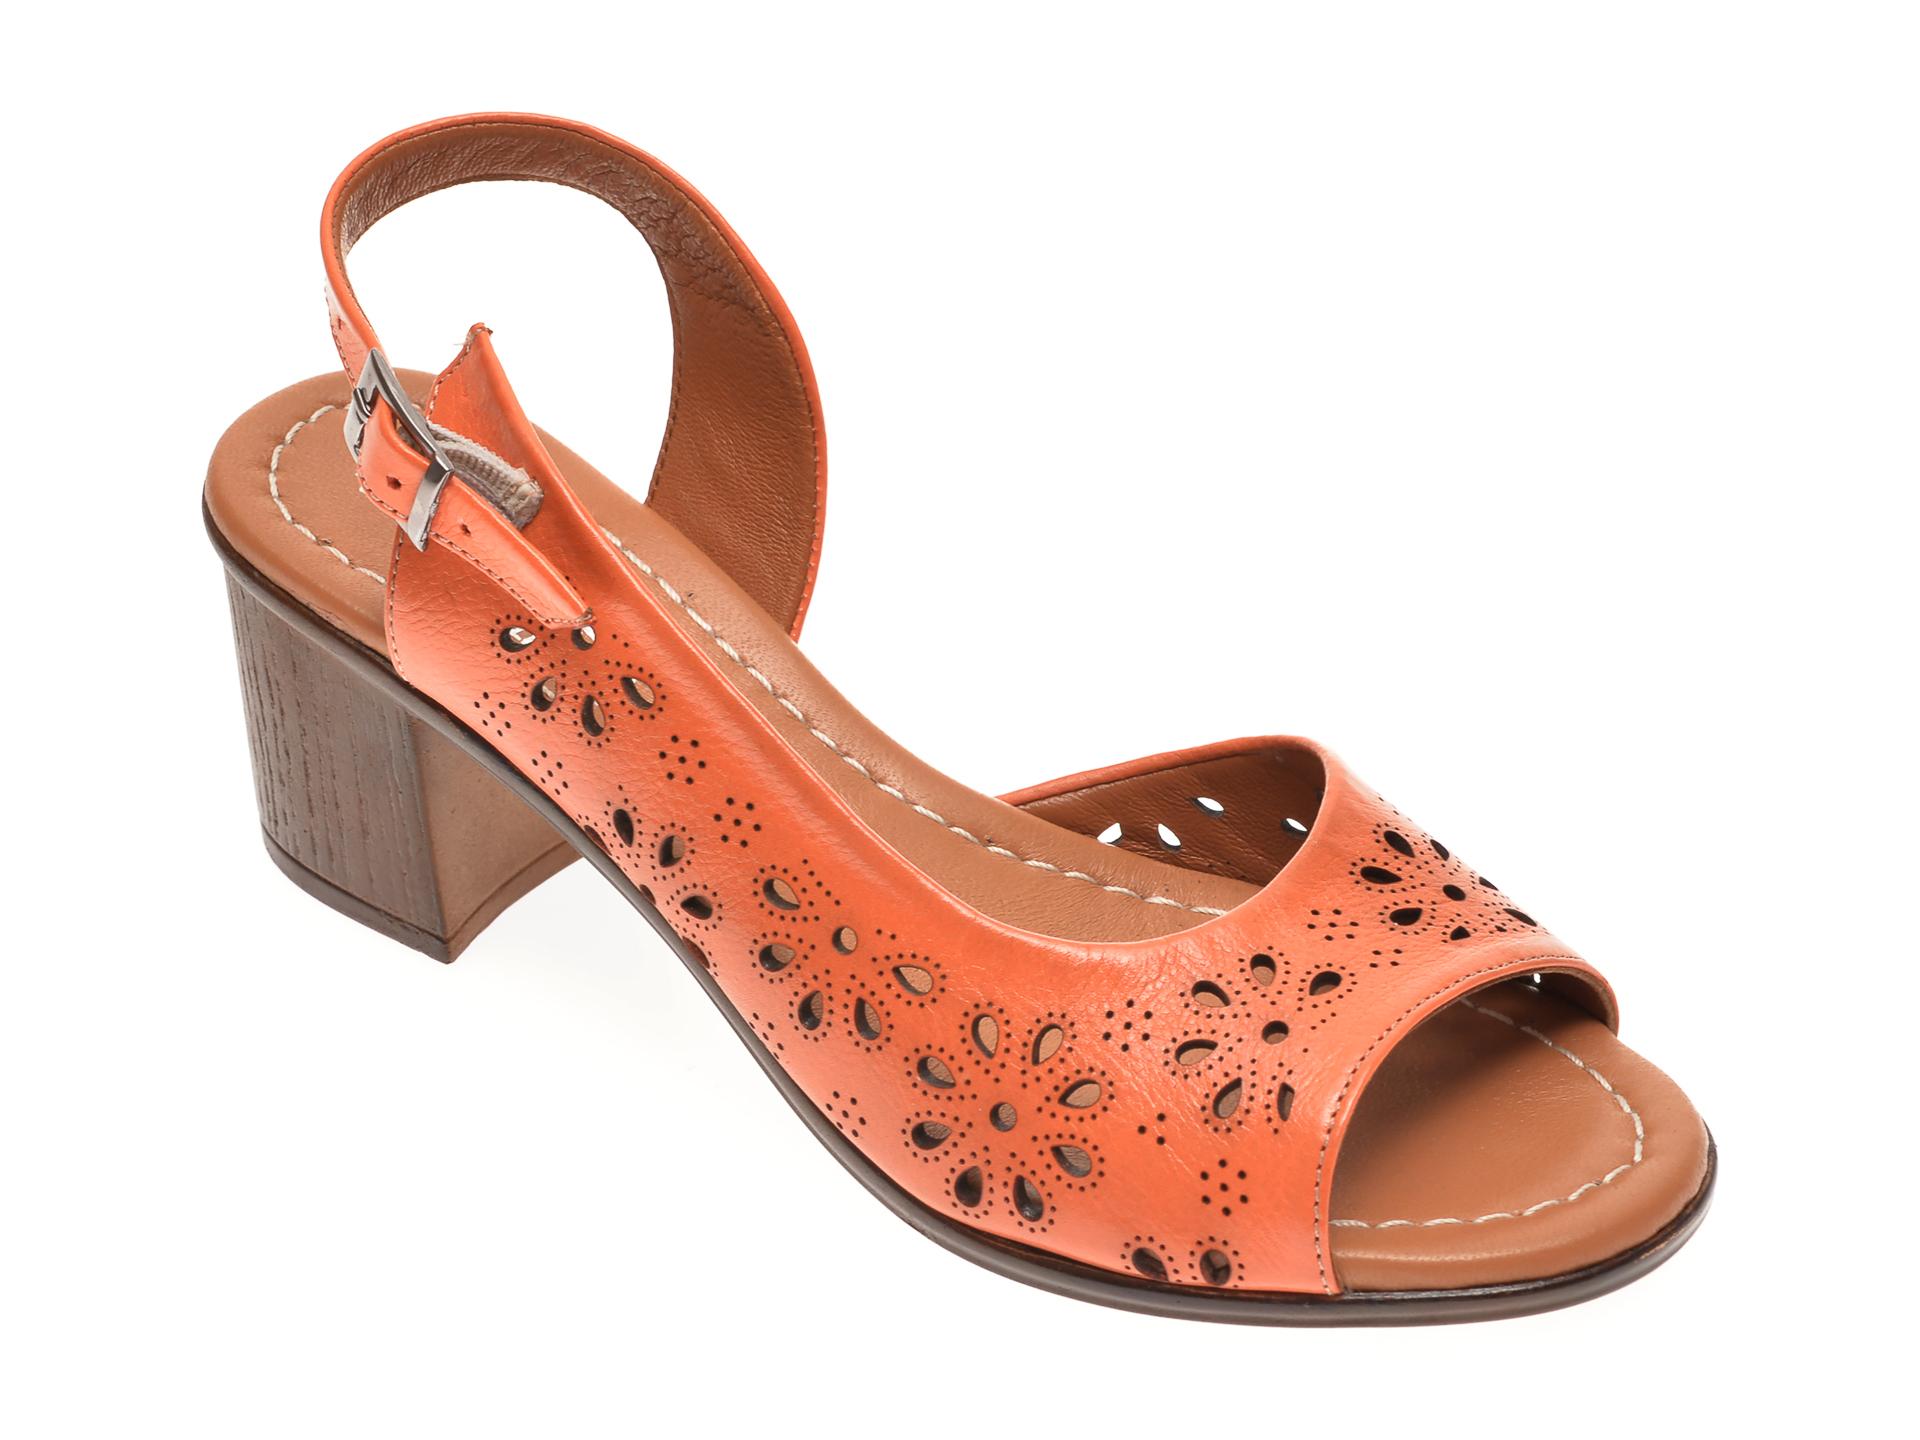 Sandale PASS COLLECTION portocalii, 105, din piele naturala